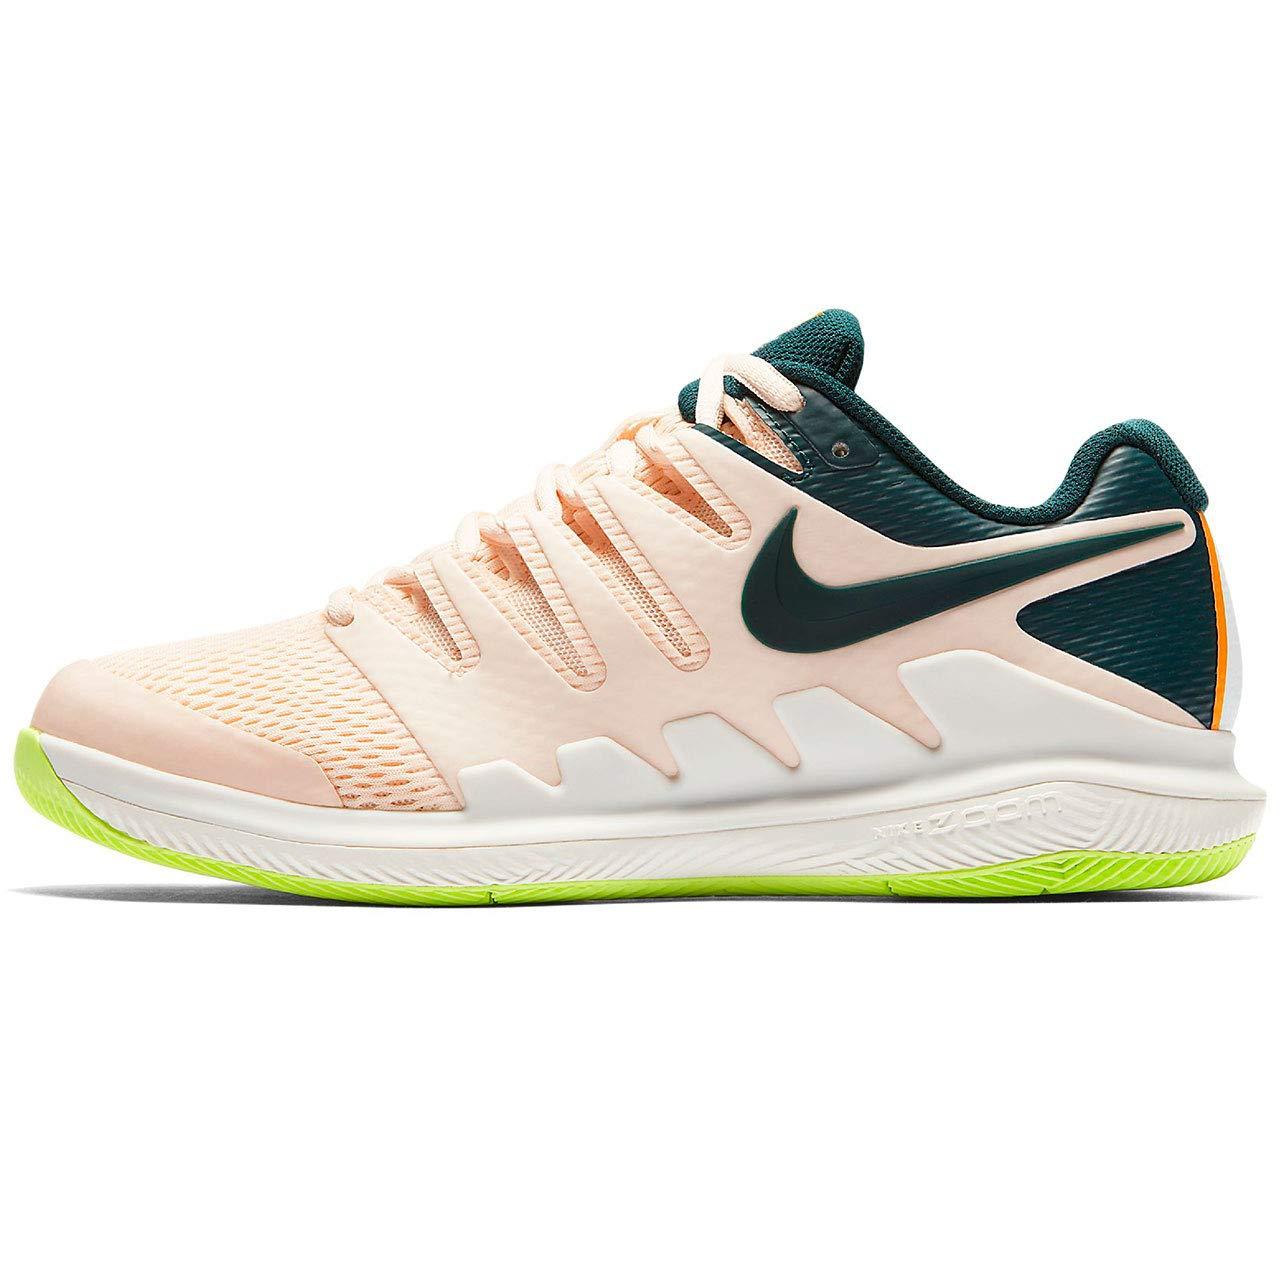 Galleon - Nike Women s Air Zoom Vapor X HC Tennis Shoe (7 B US ... 12444d5fb